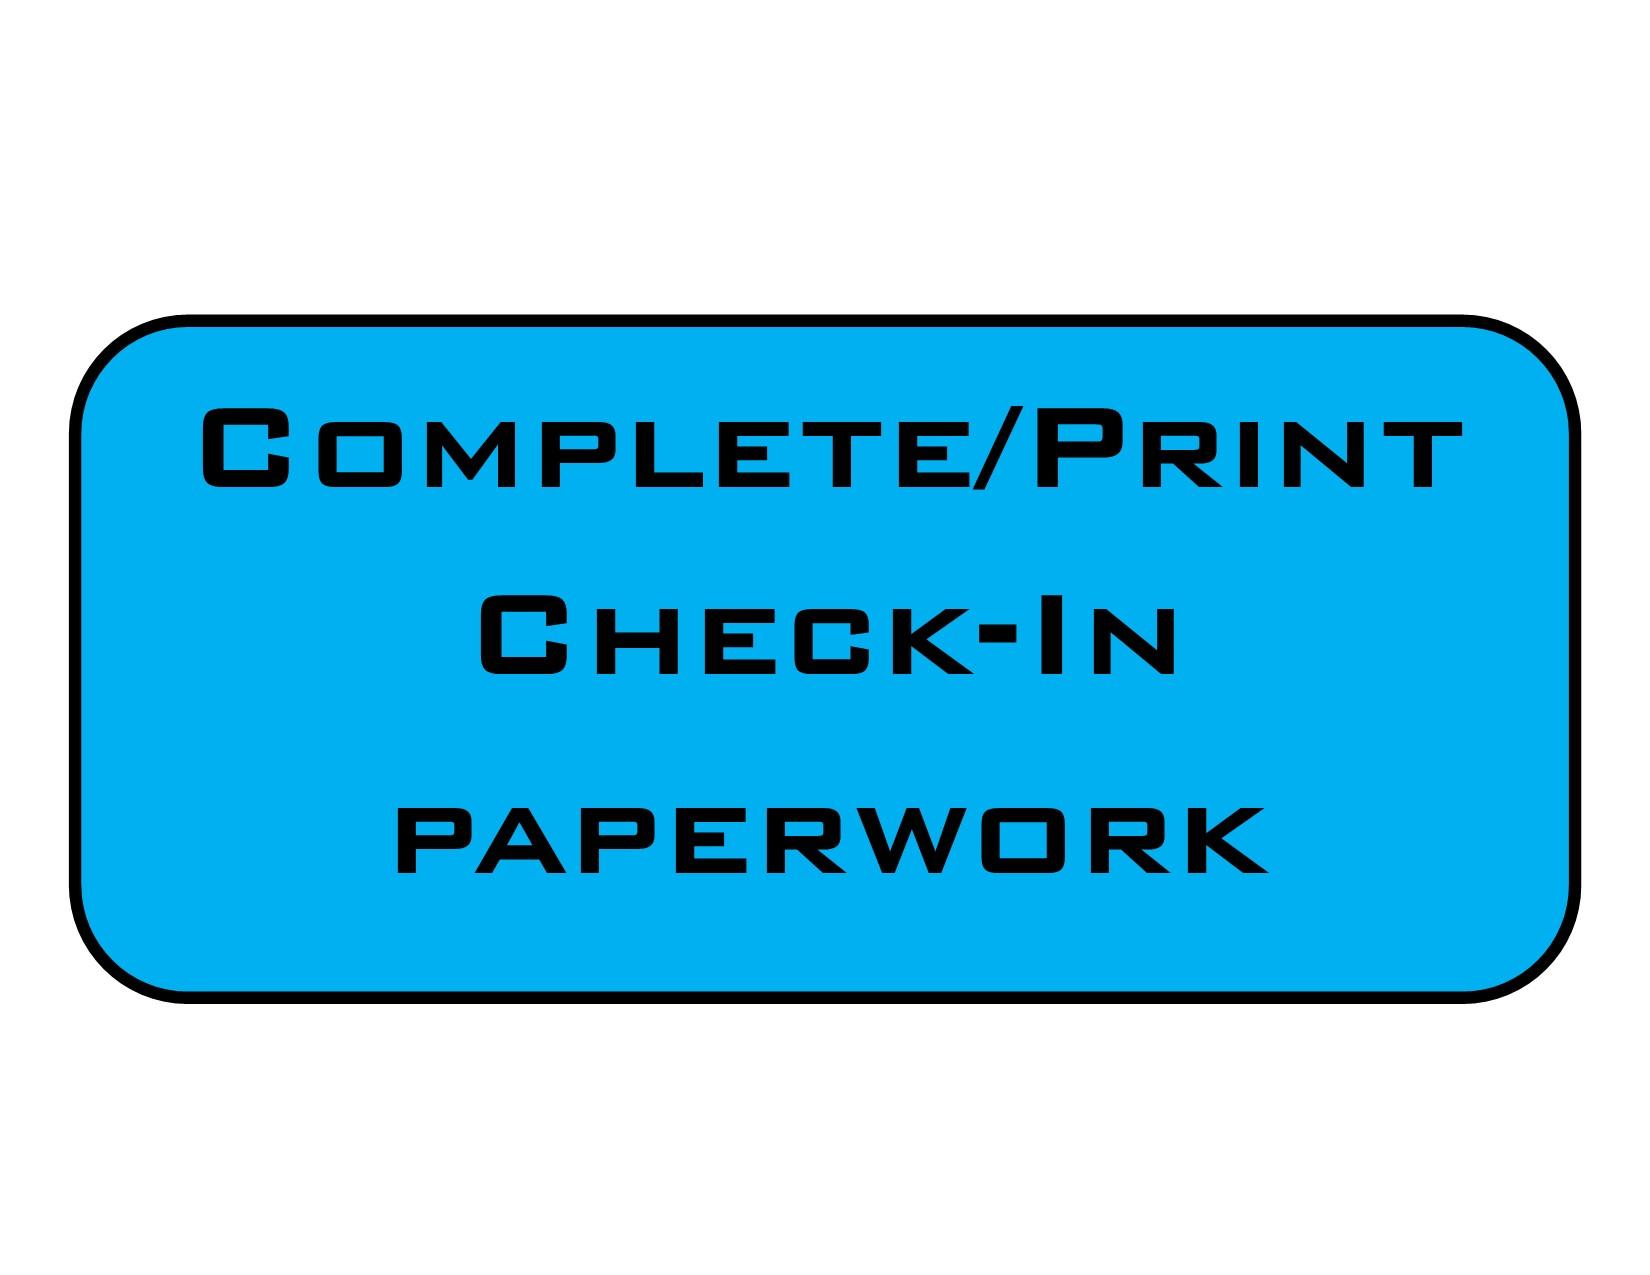 paperwork_button